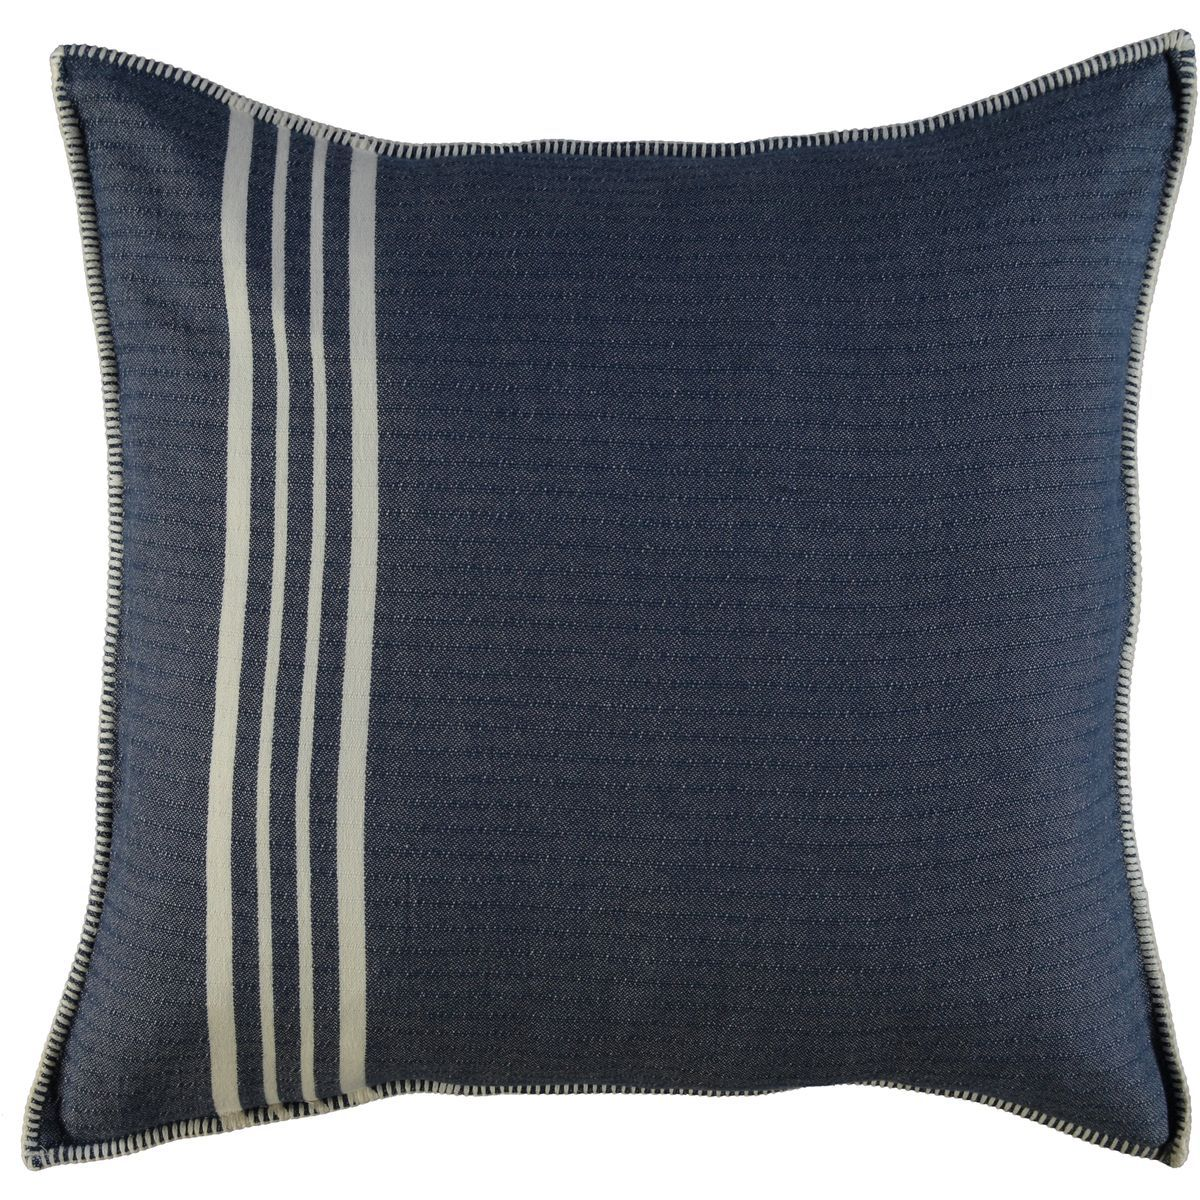 Cushion Cover Sultan - Navy / 65x65